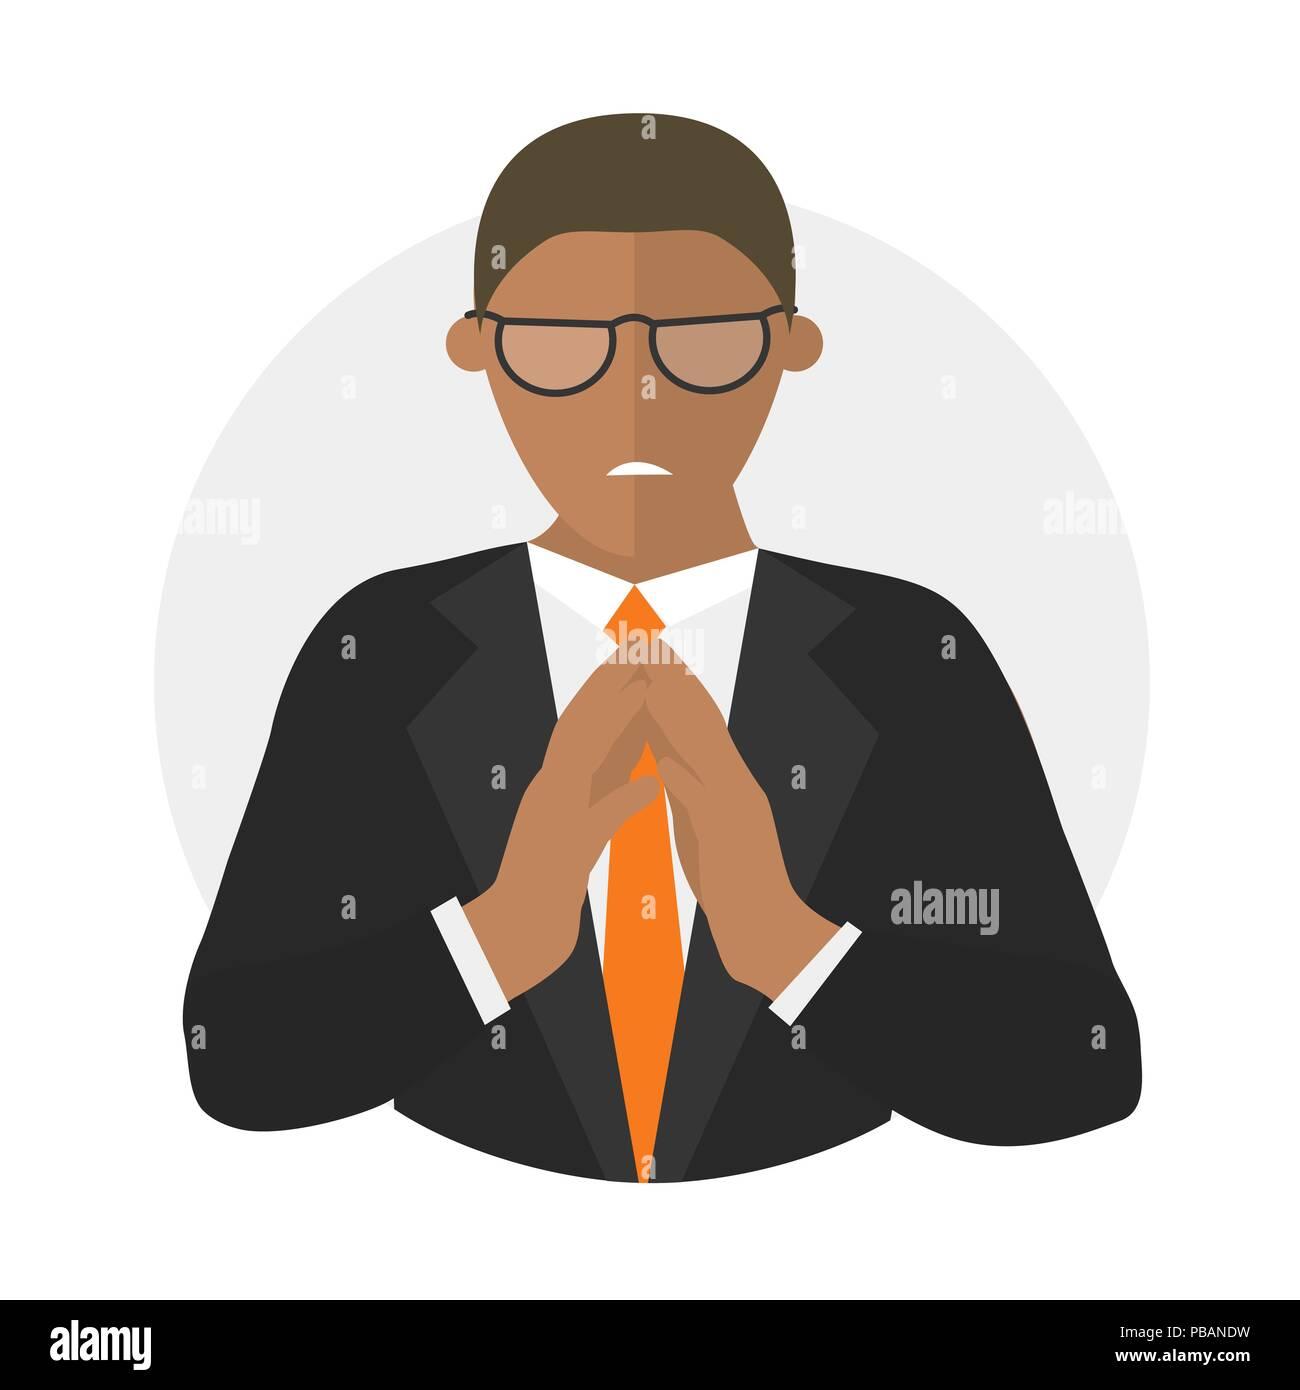 Insidious, envious, evil businessman flat design icon - Stock Vector